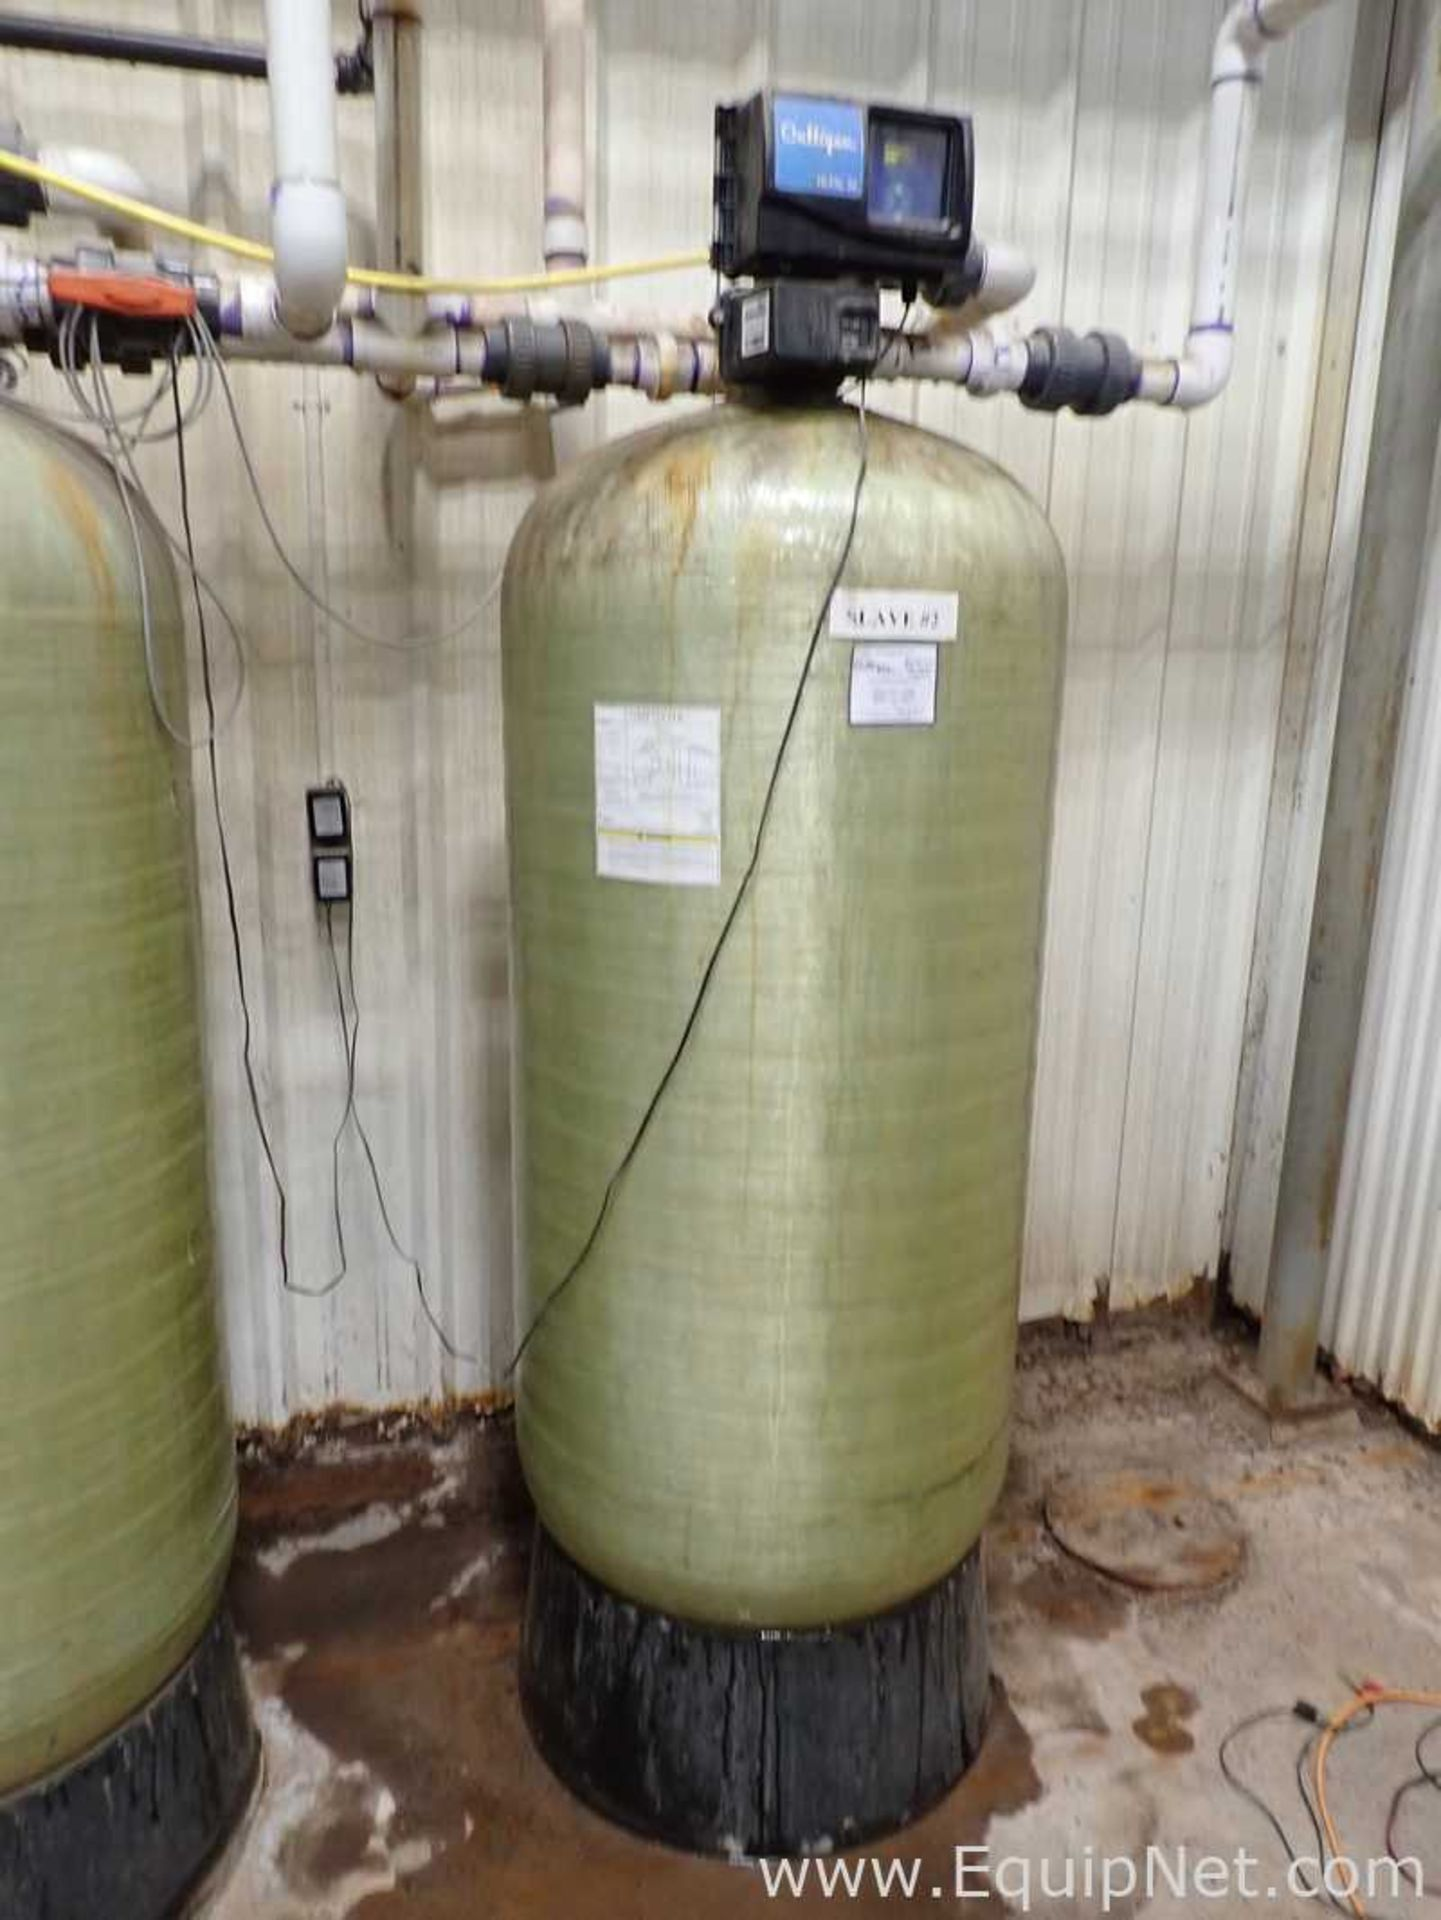 Culligan Hi-Flo 3e Water Softener System - Image 7 of 9